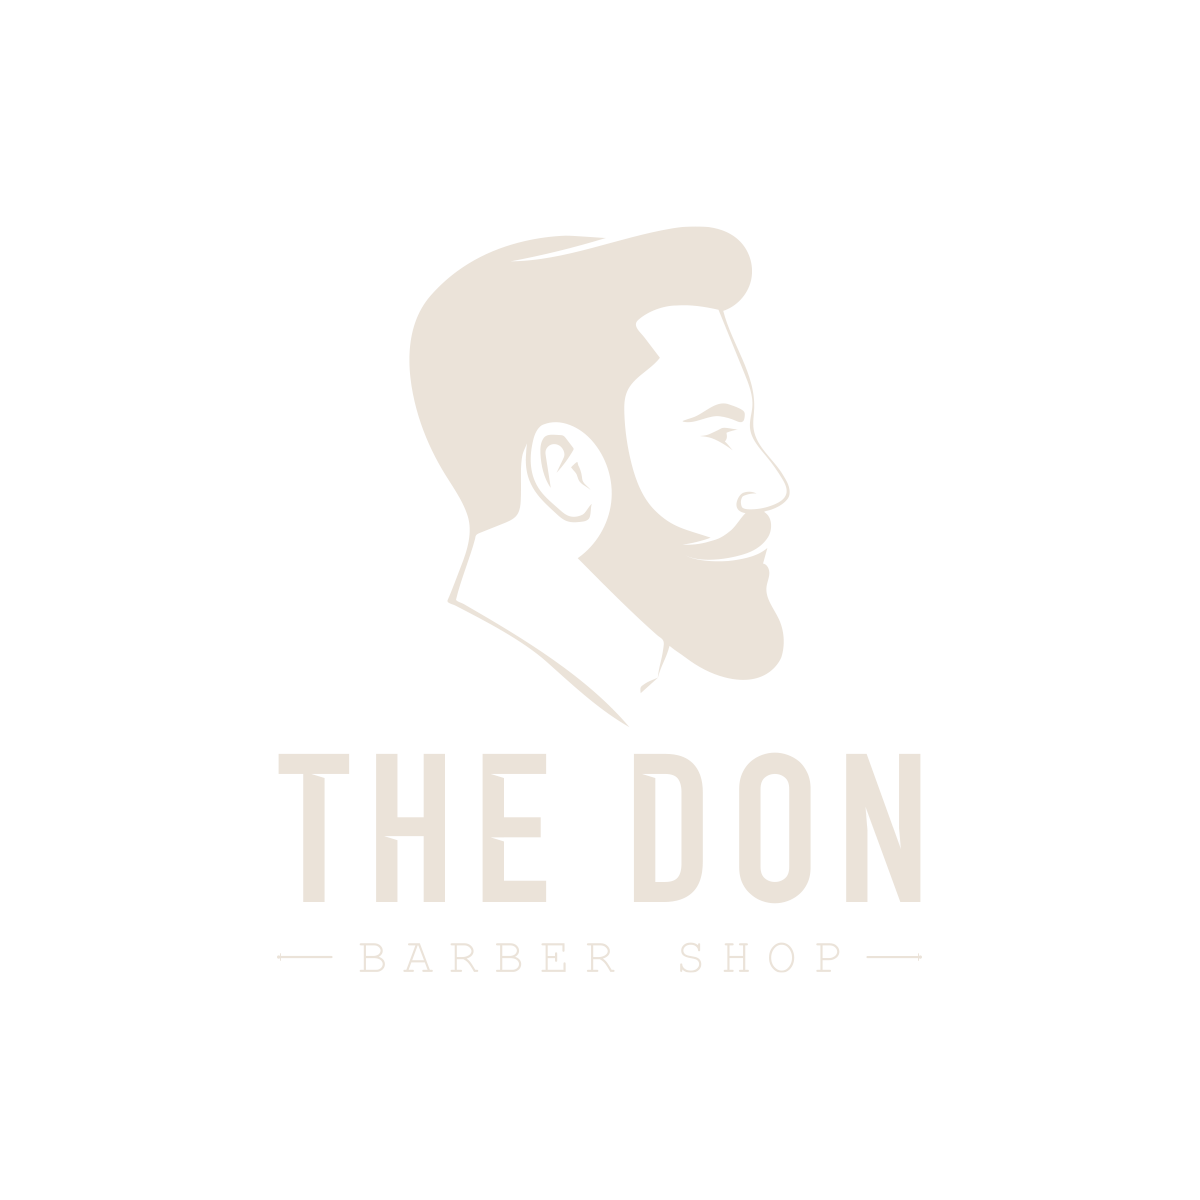 Logo of Man with a beard